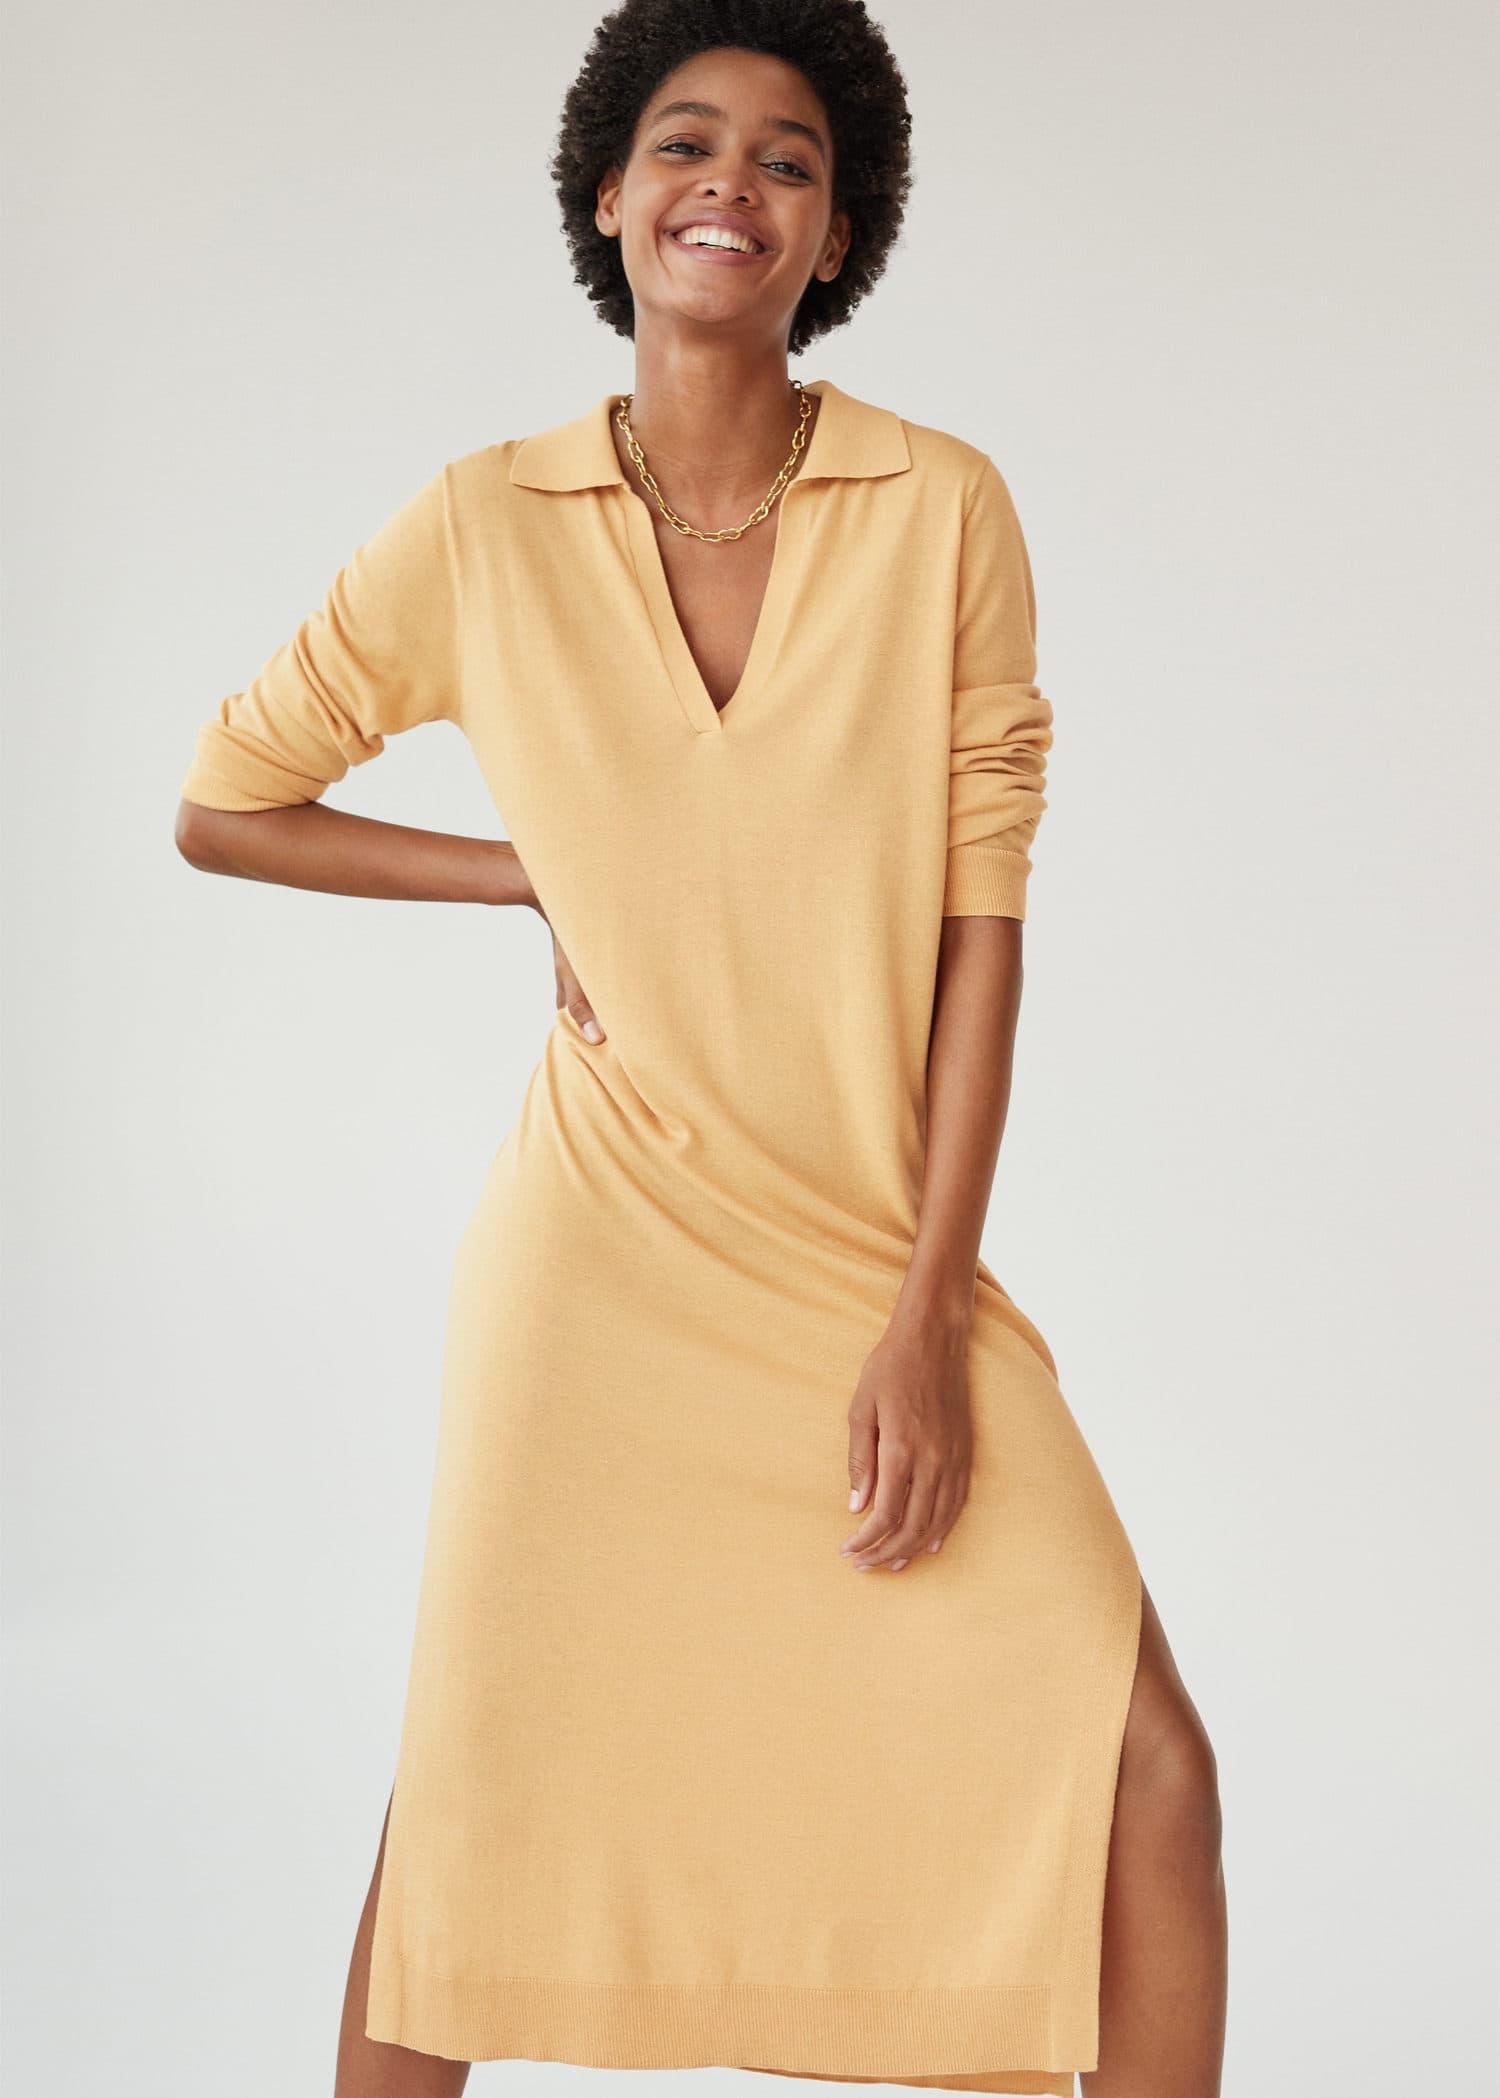 Robe Maille Femme Mango France